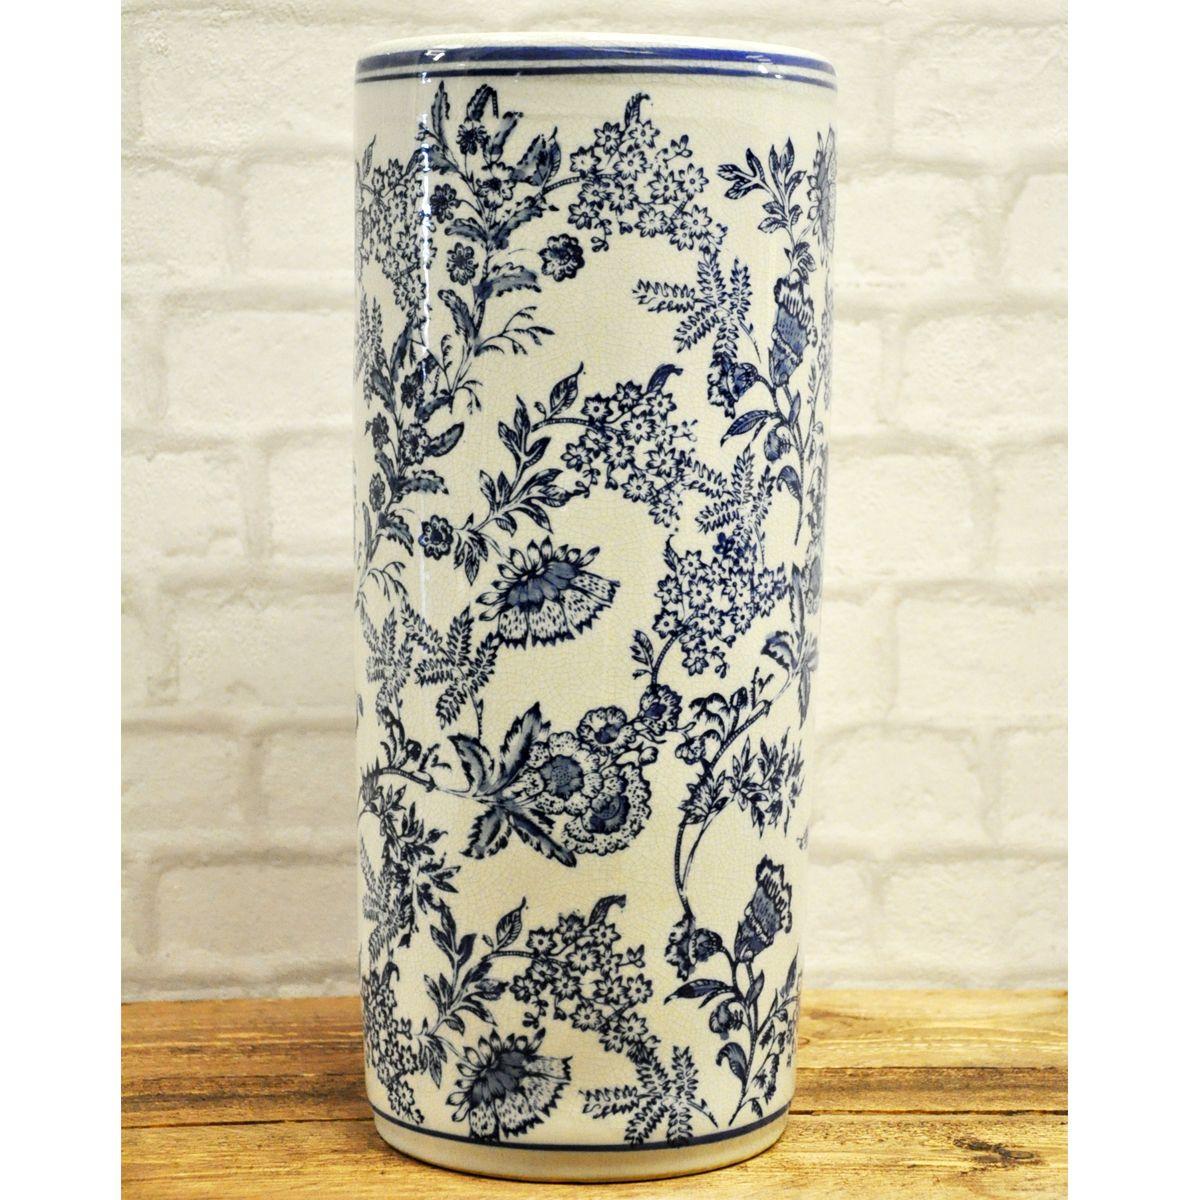 Blue & White Vintage Style Ceramic Floral Umbrella Stand | Decor ...